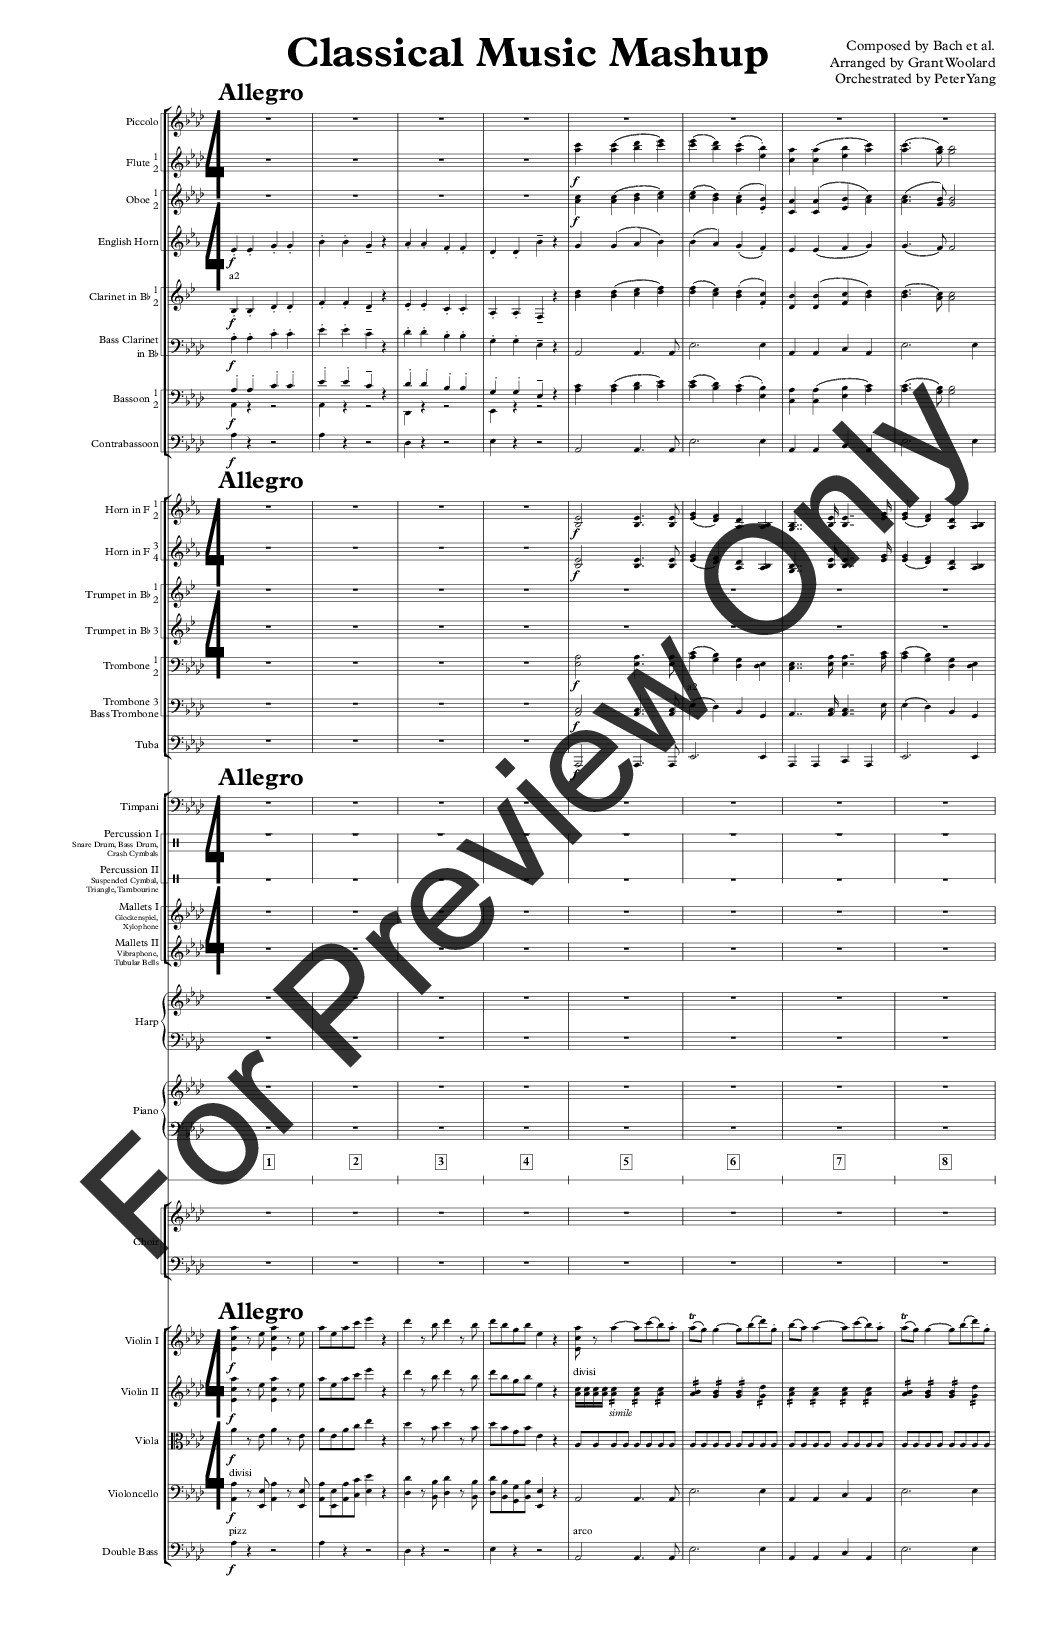 Classical Music Mashup by Grant Woolard / Peter Y | J W